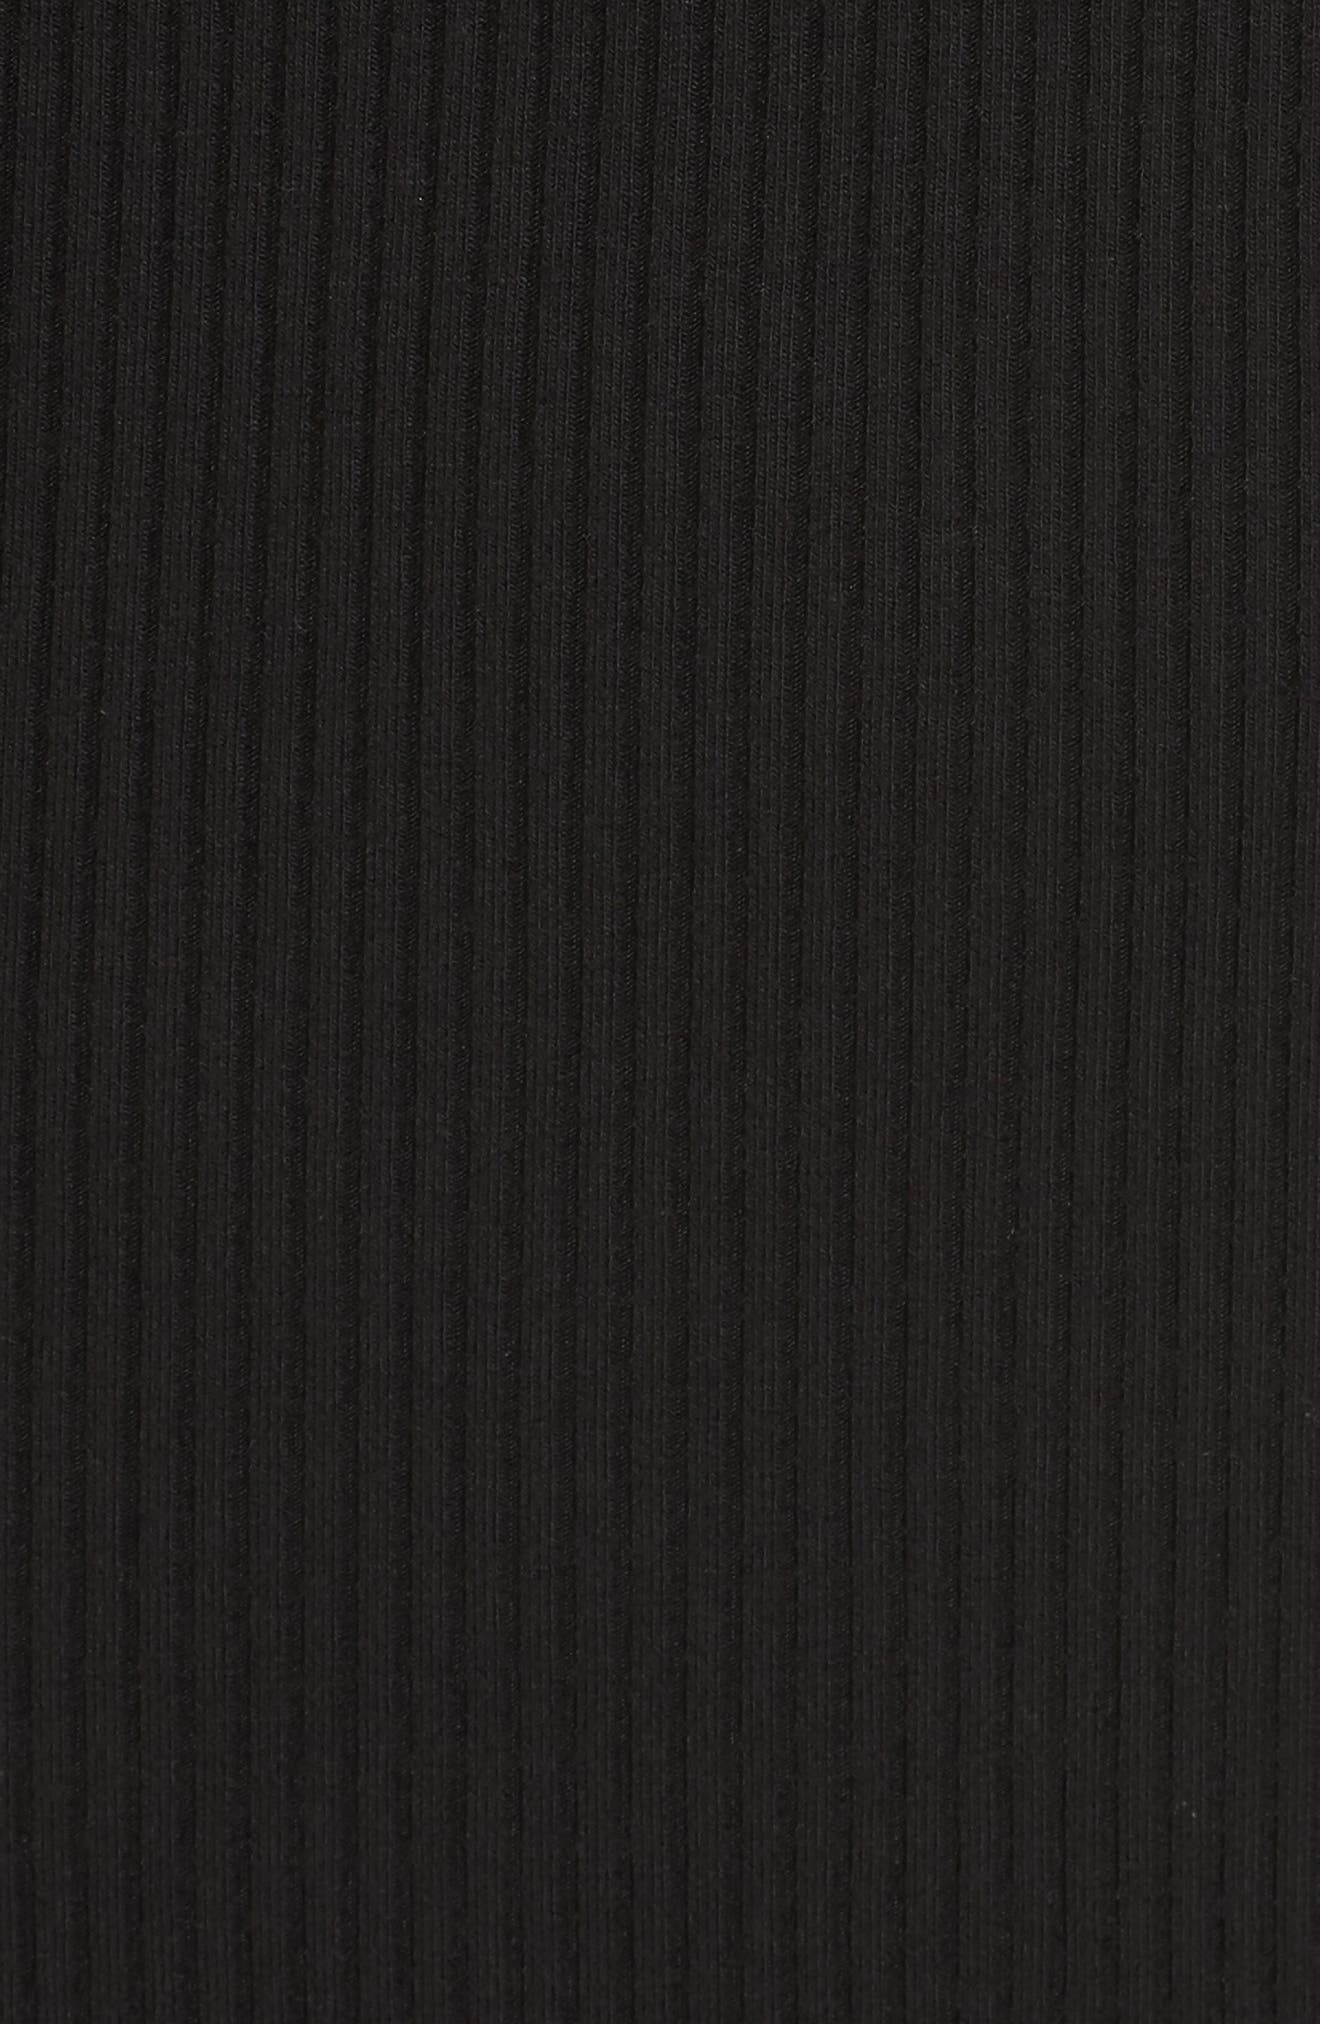 Klassen Choker Dress,                             Alternate thumbnail 5, color,                             001